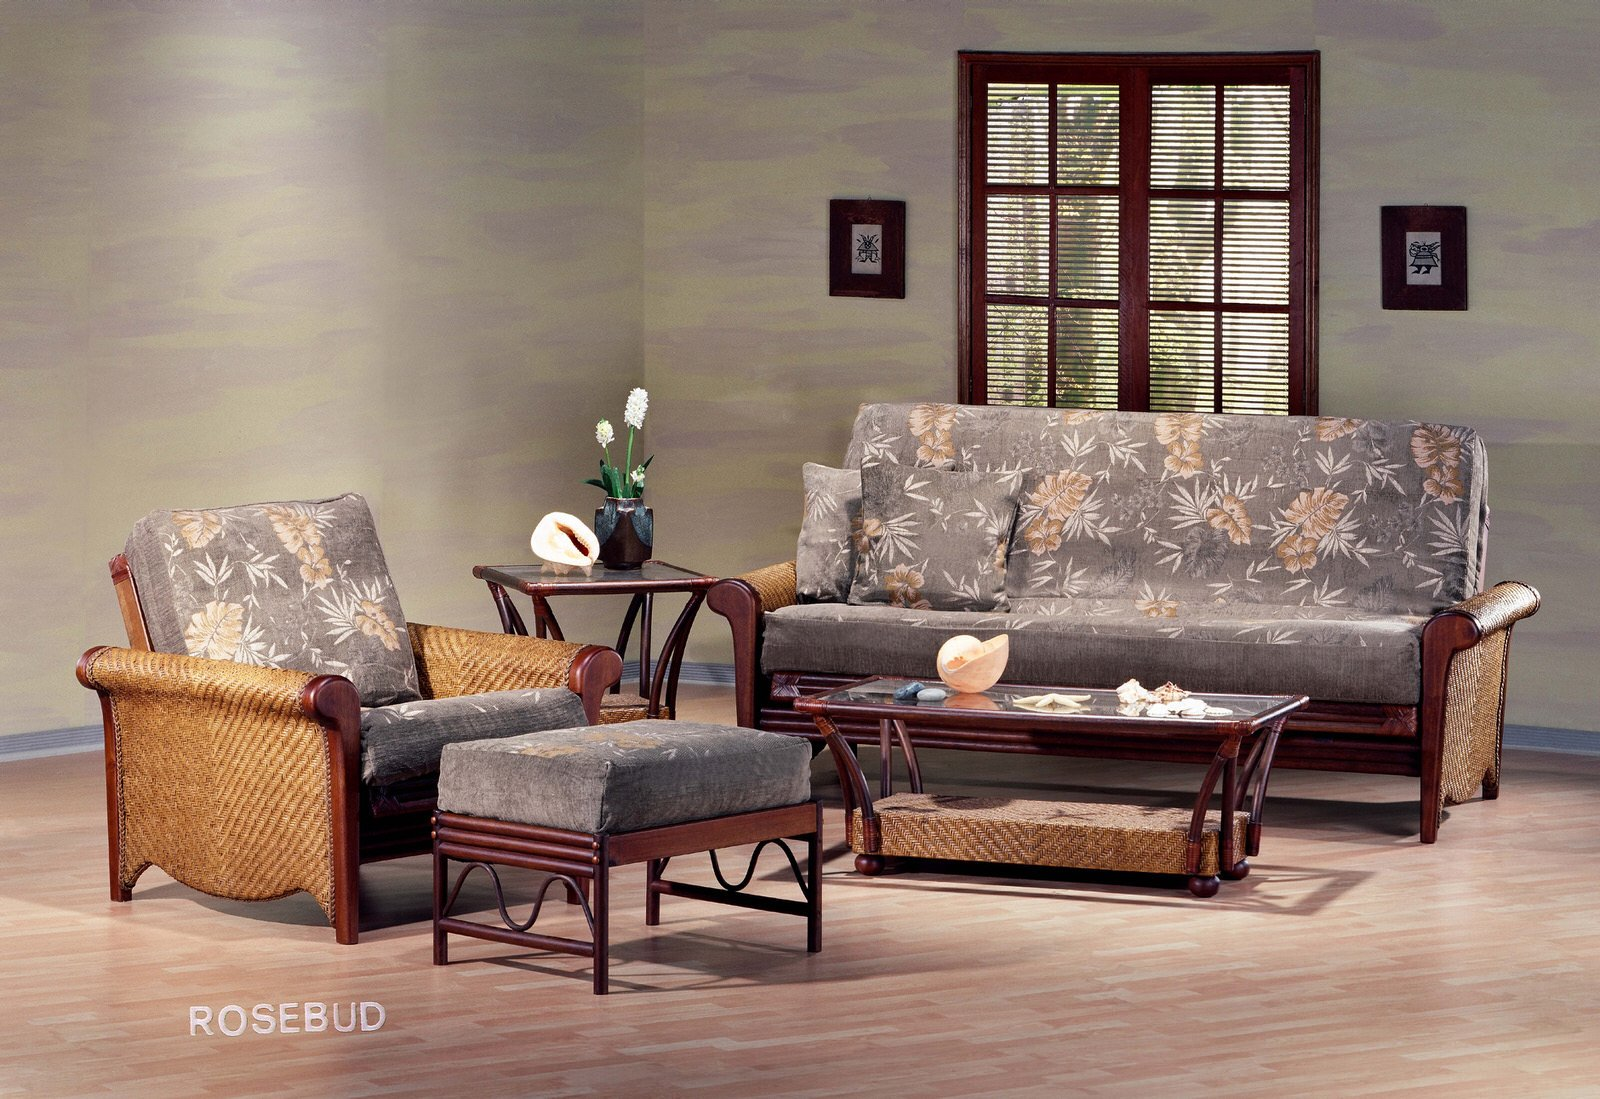 Rosebud Rattan Futon Frame By Night Amp Day Furniture